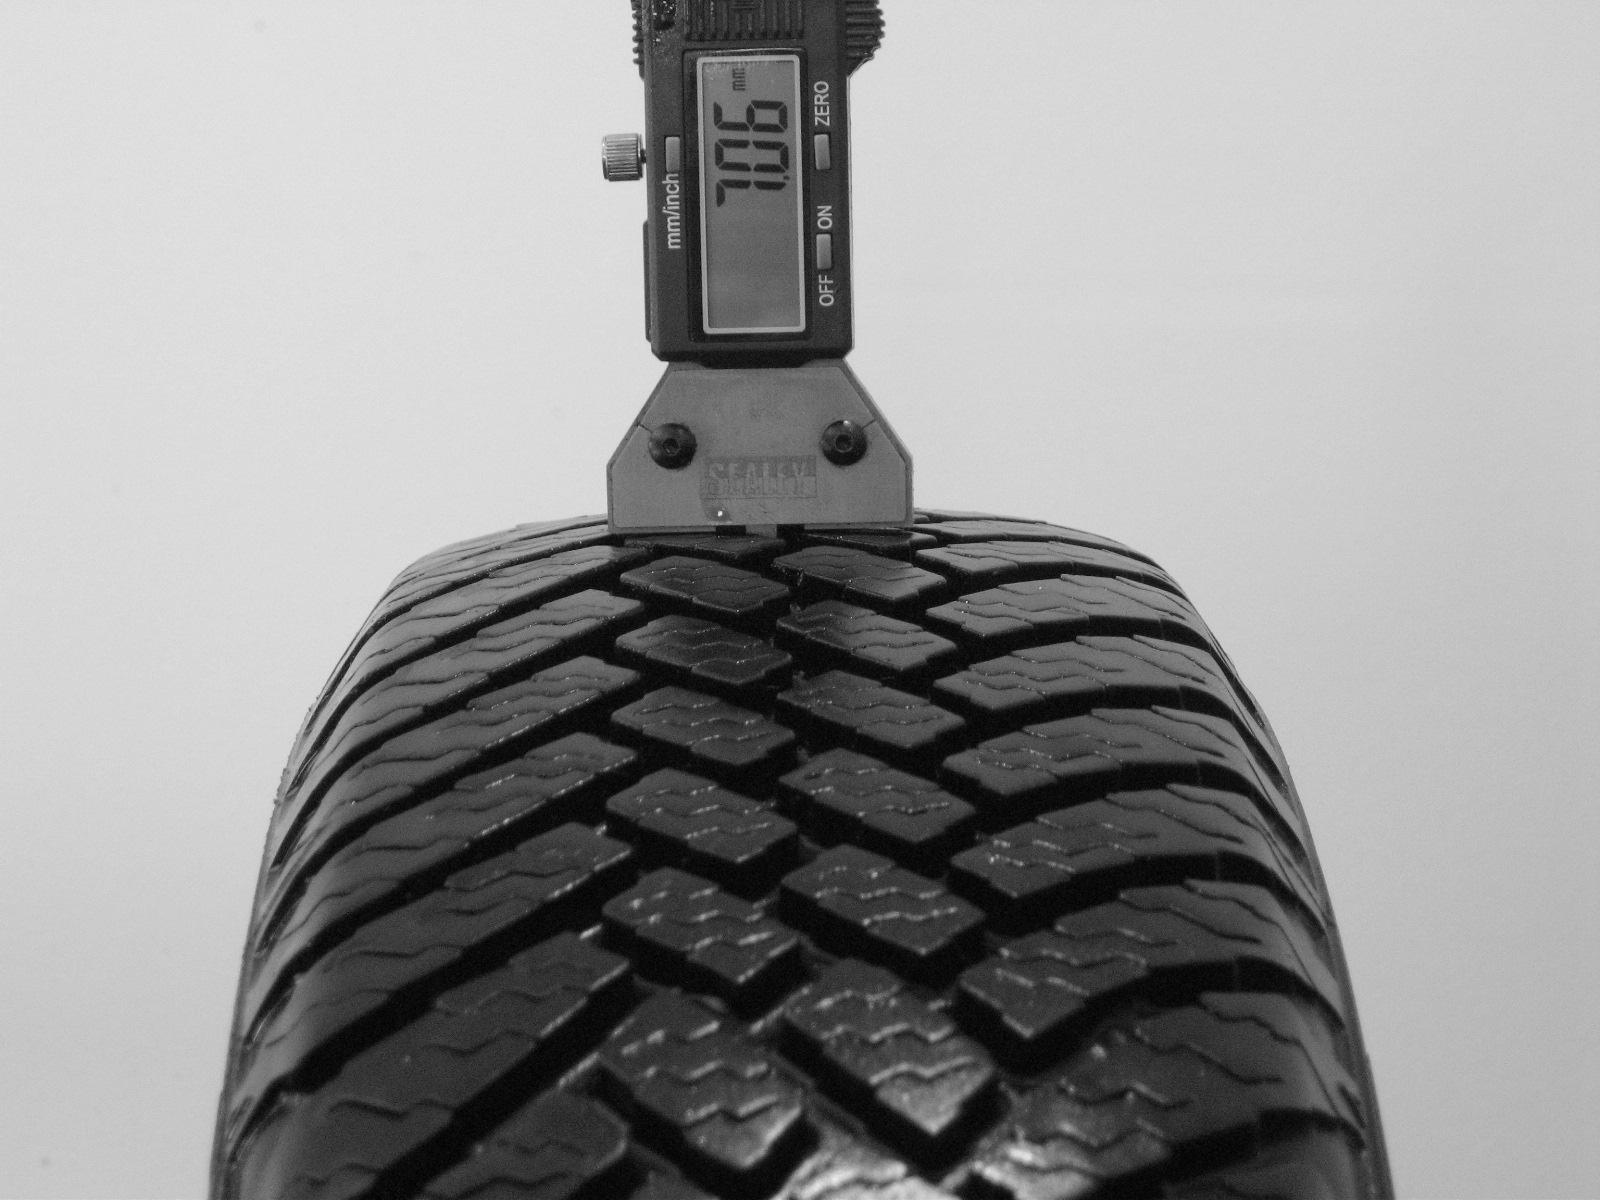 Použité-Pneu-Bazar - 155/70 R13 POWER 3000 M+S -kusovka-rezerva 3mm